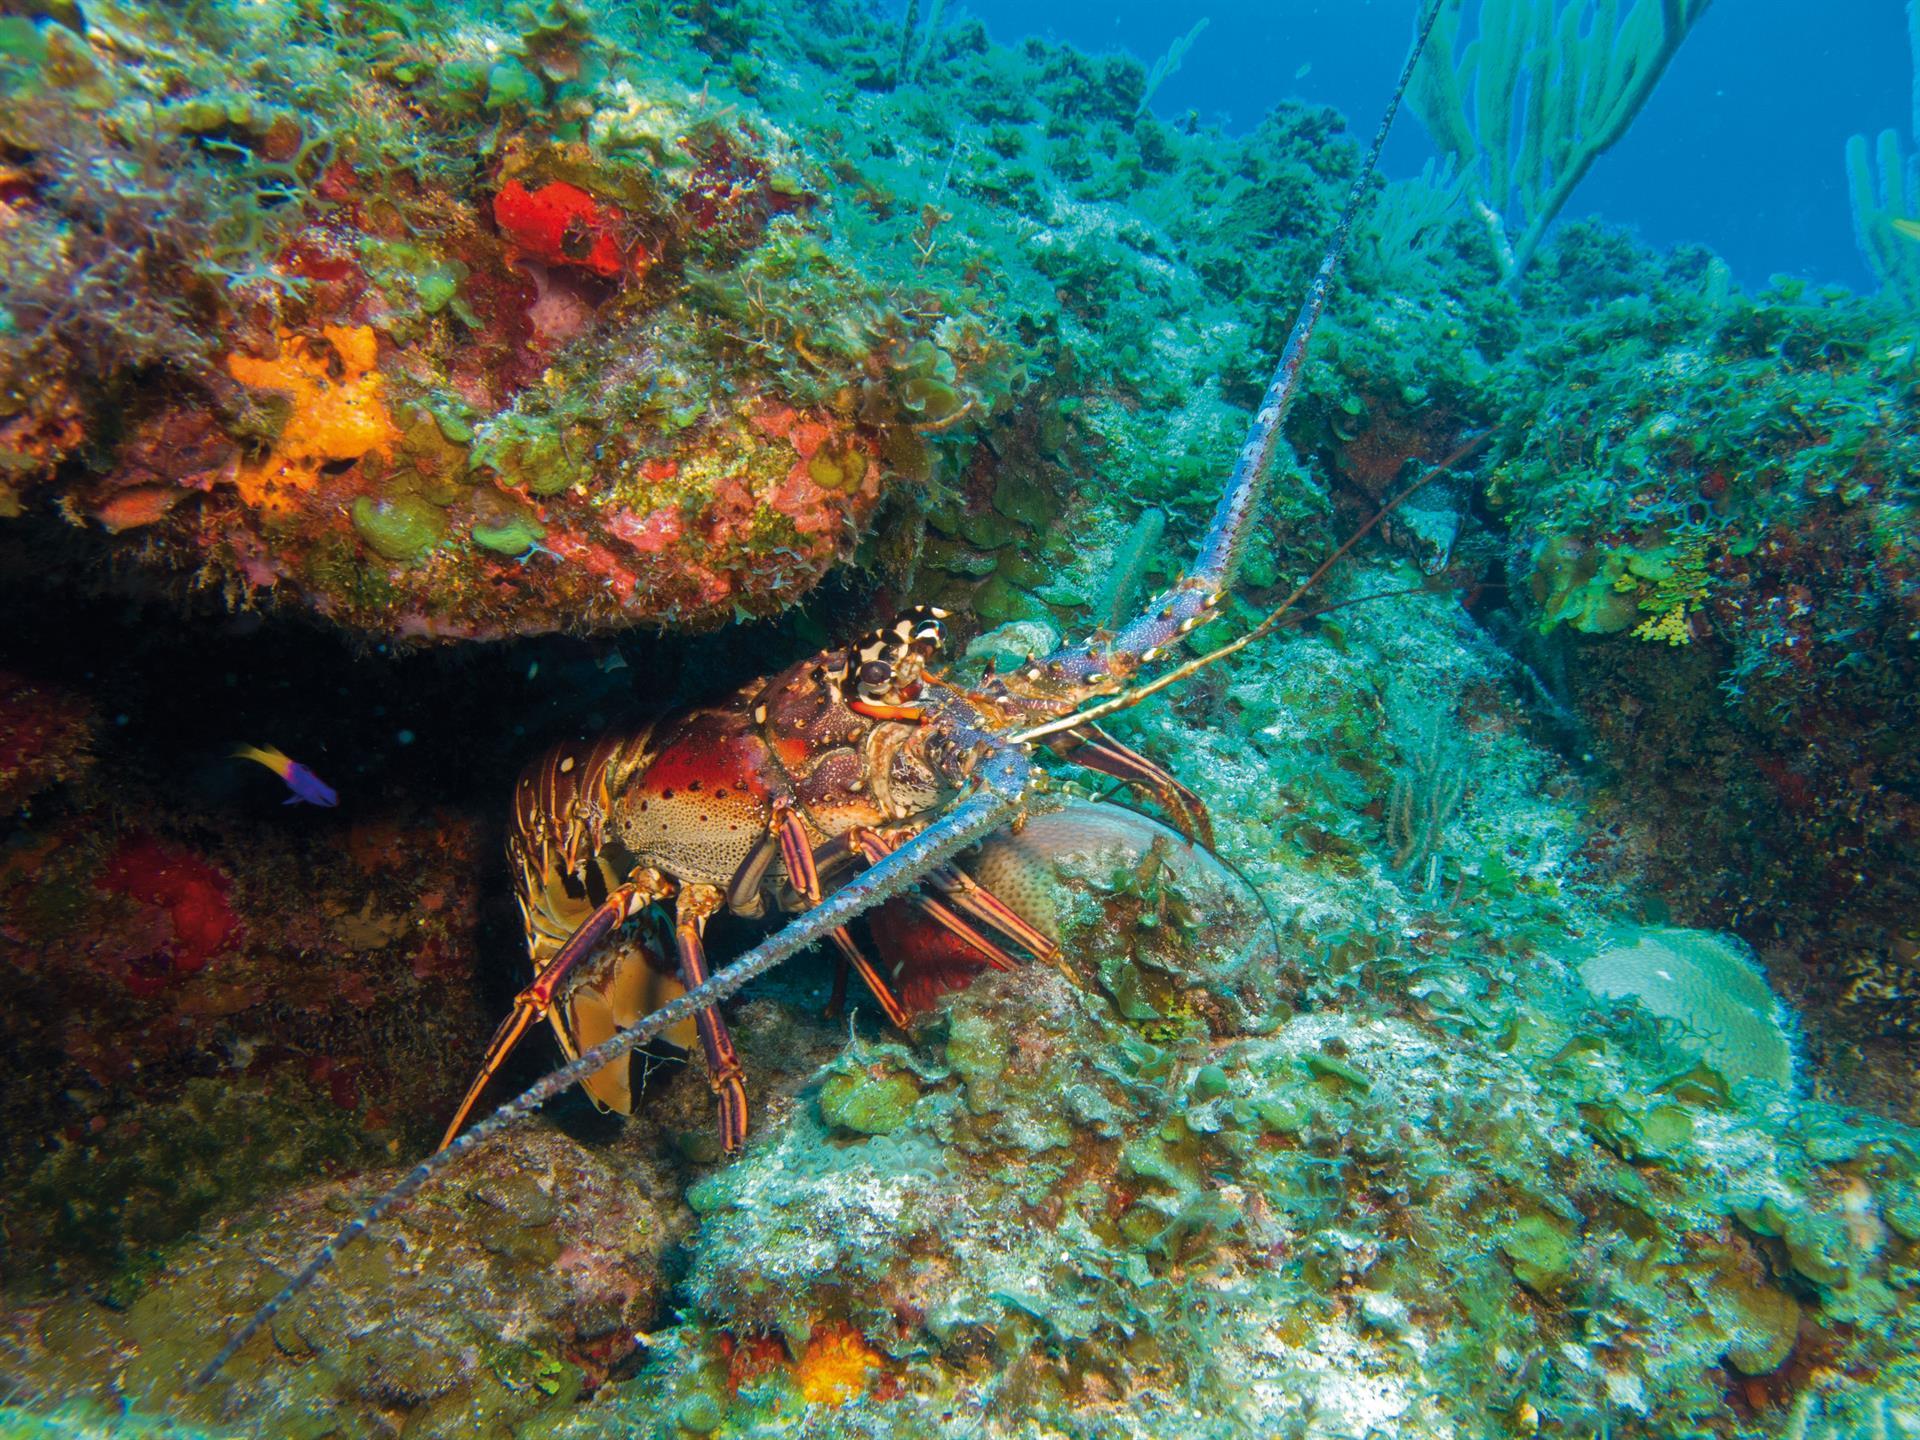 presidio_aragosta_slow fish caribe